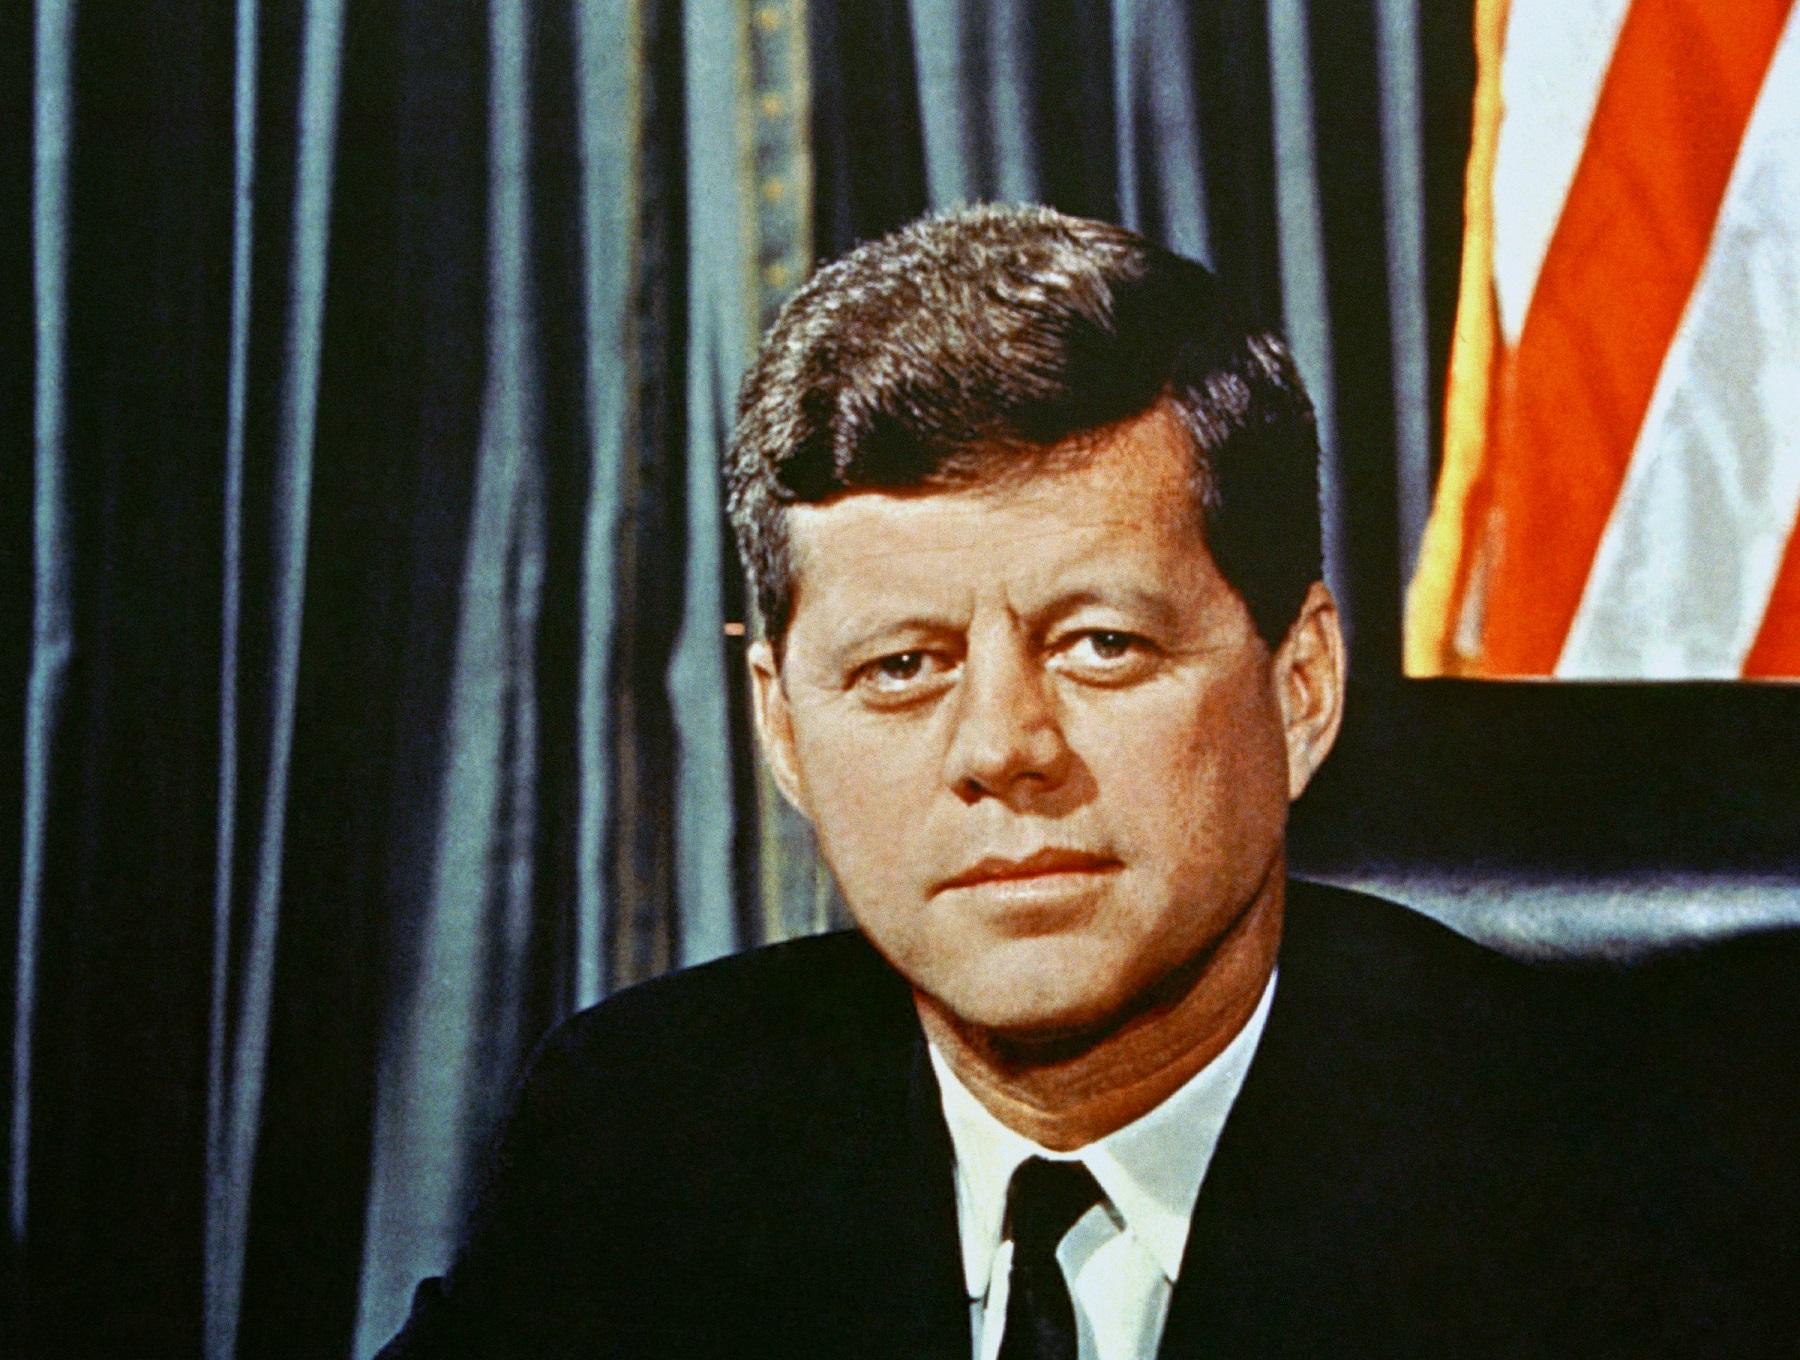 U.S  President John F. Kennedy, 1963  (AP Photo)